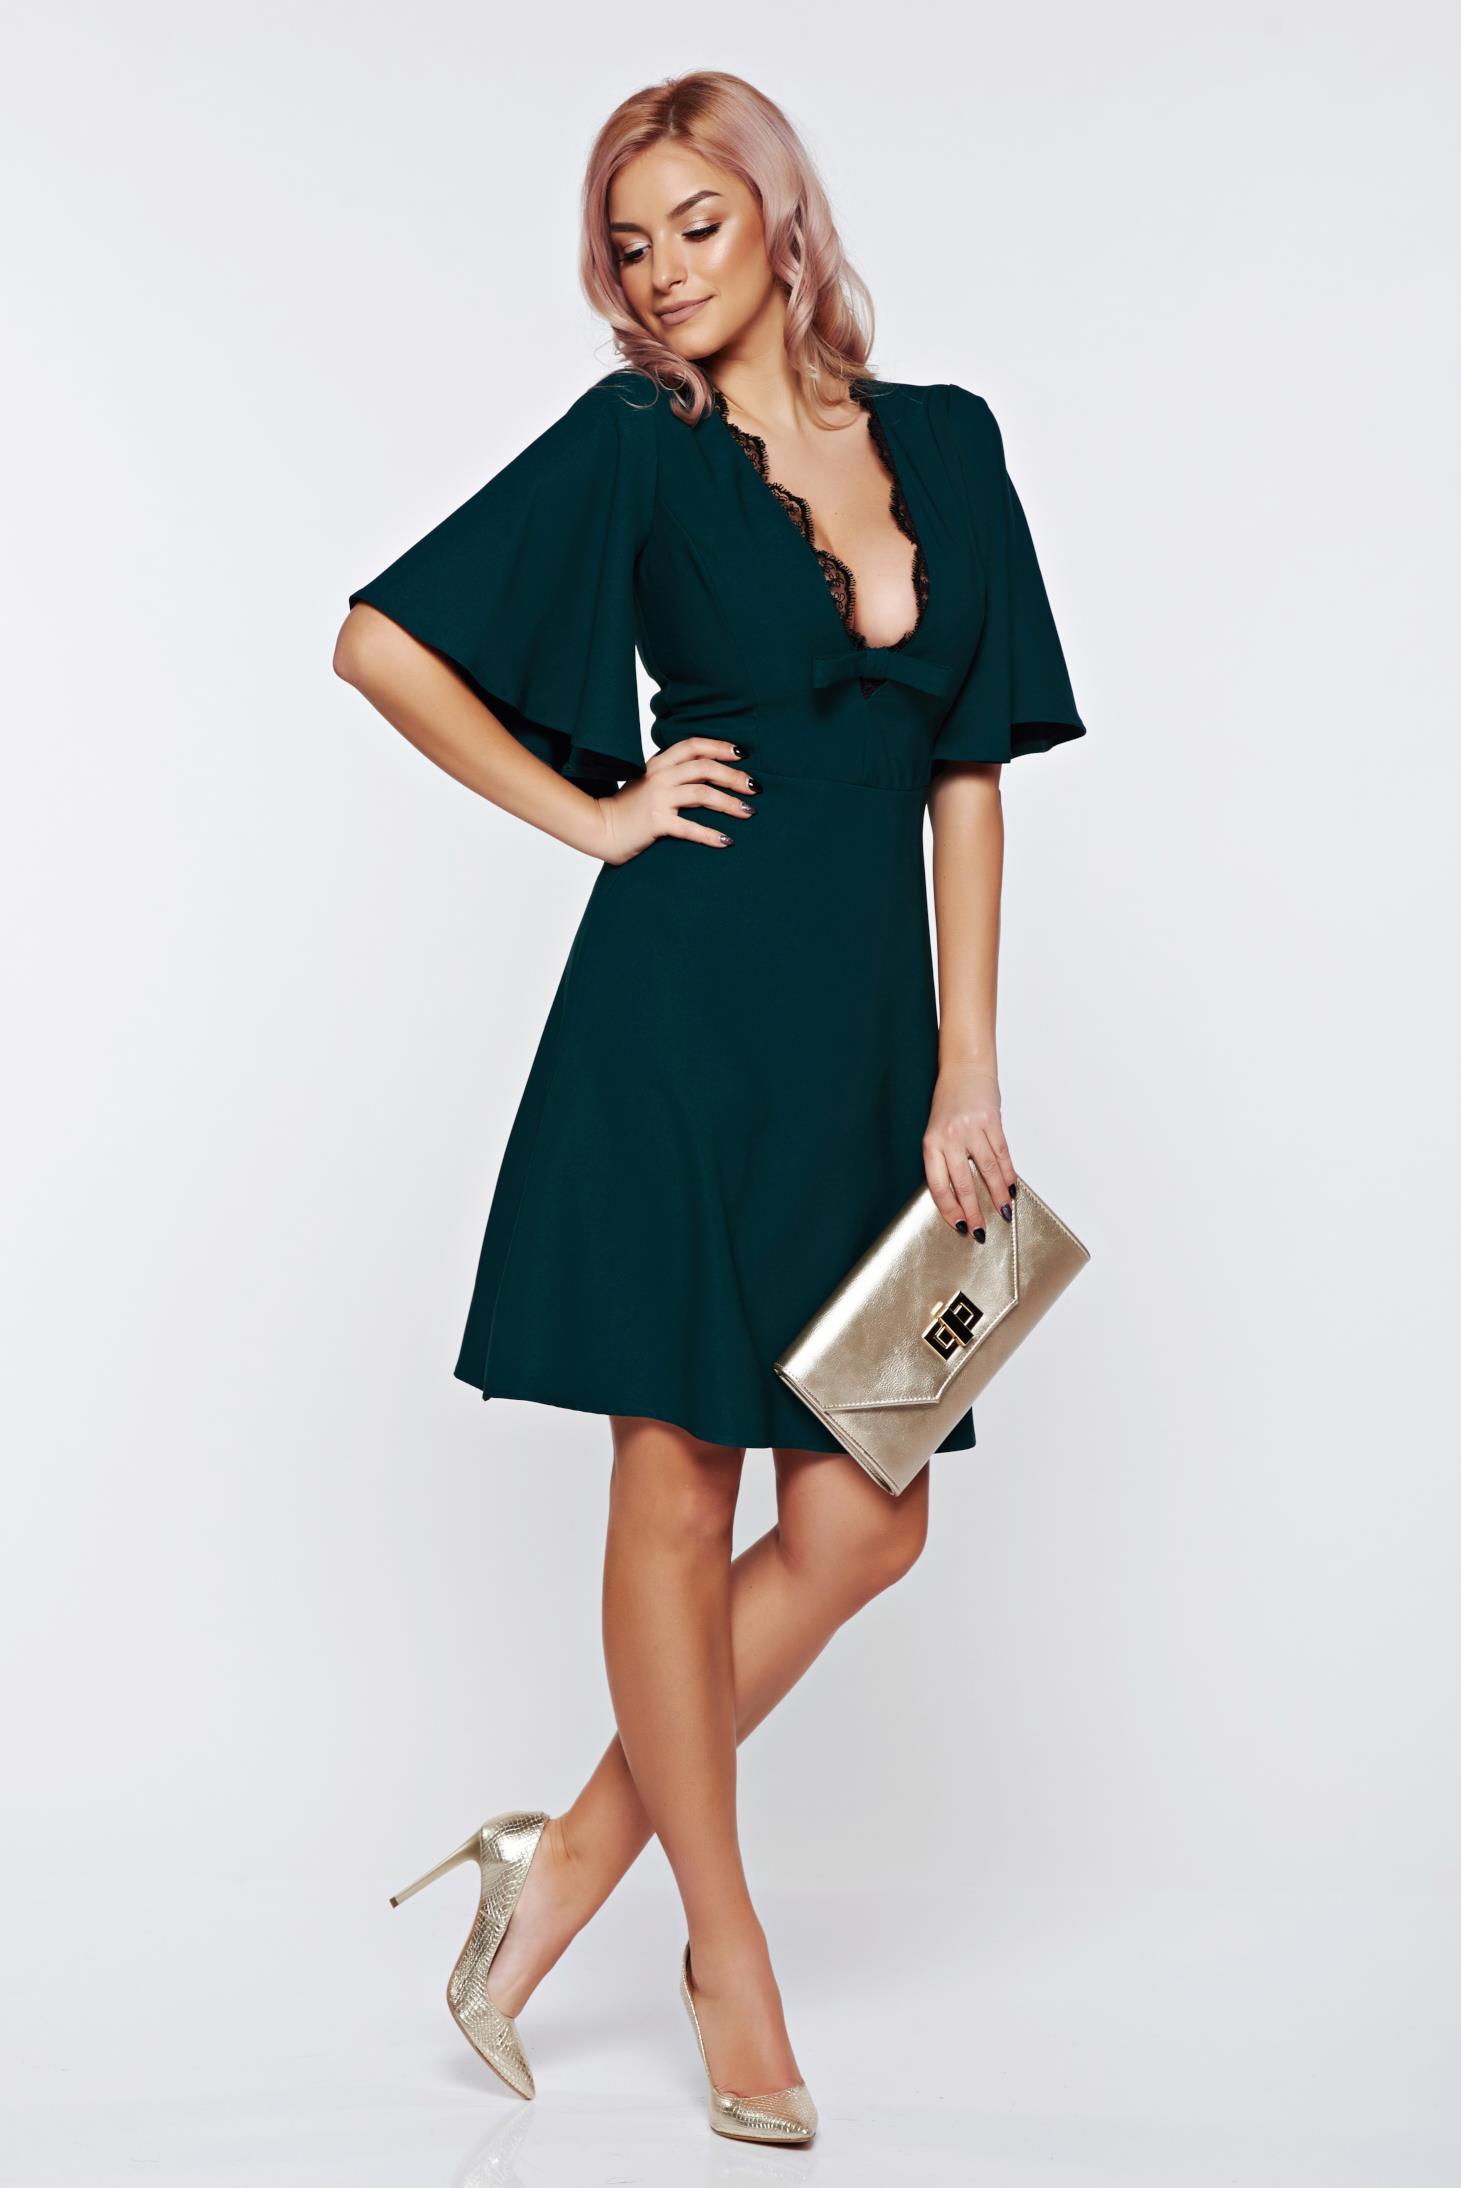 Cleavage Dress